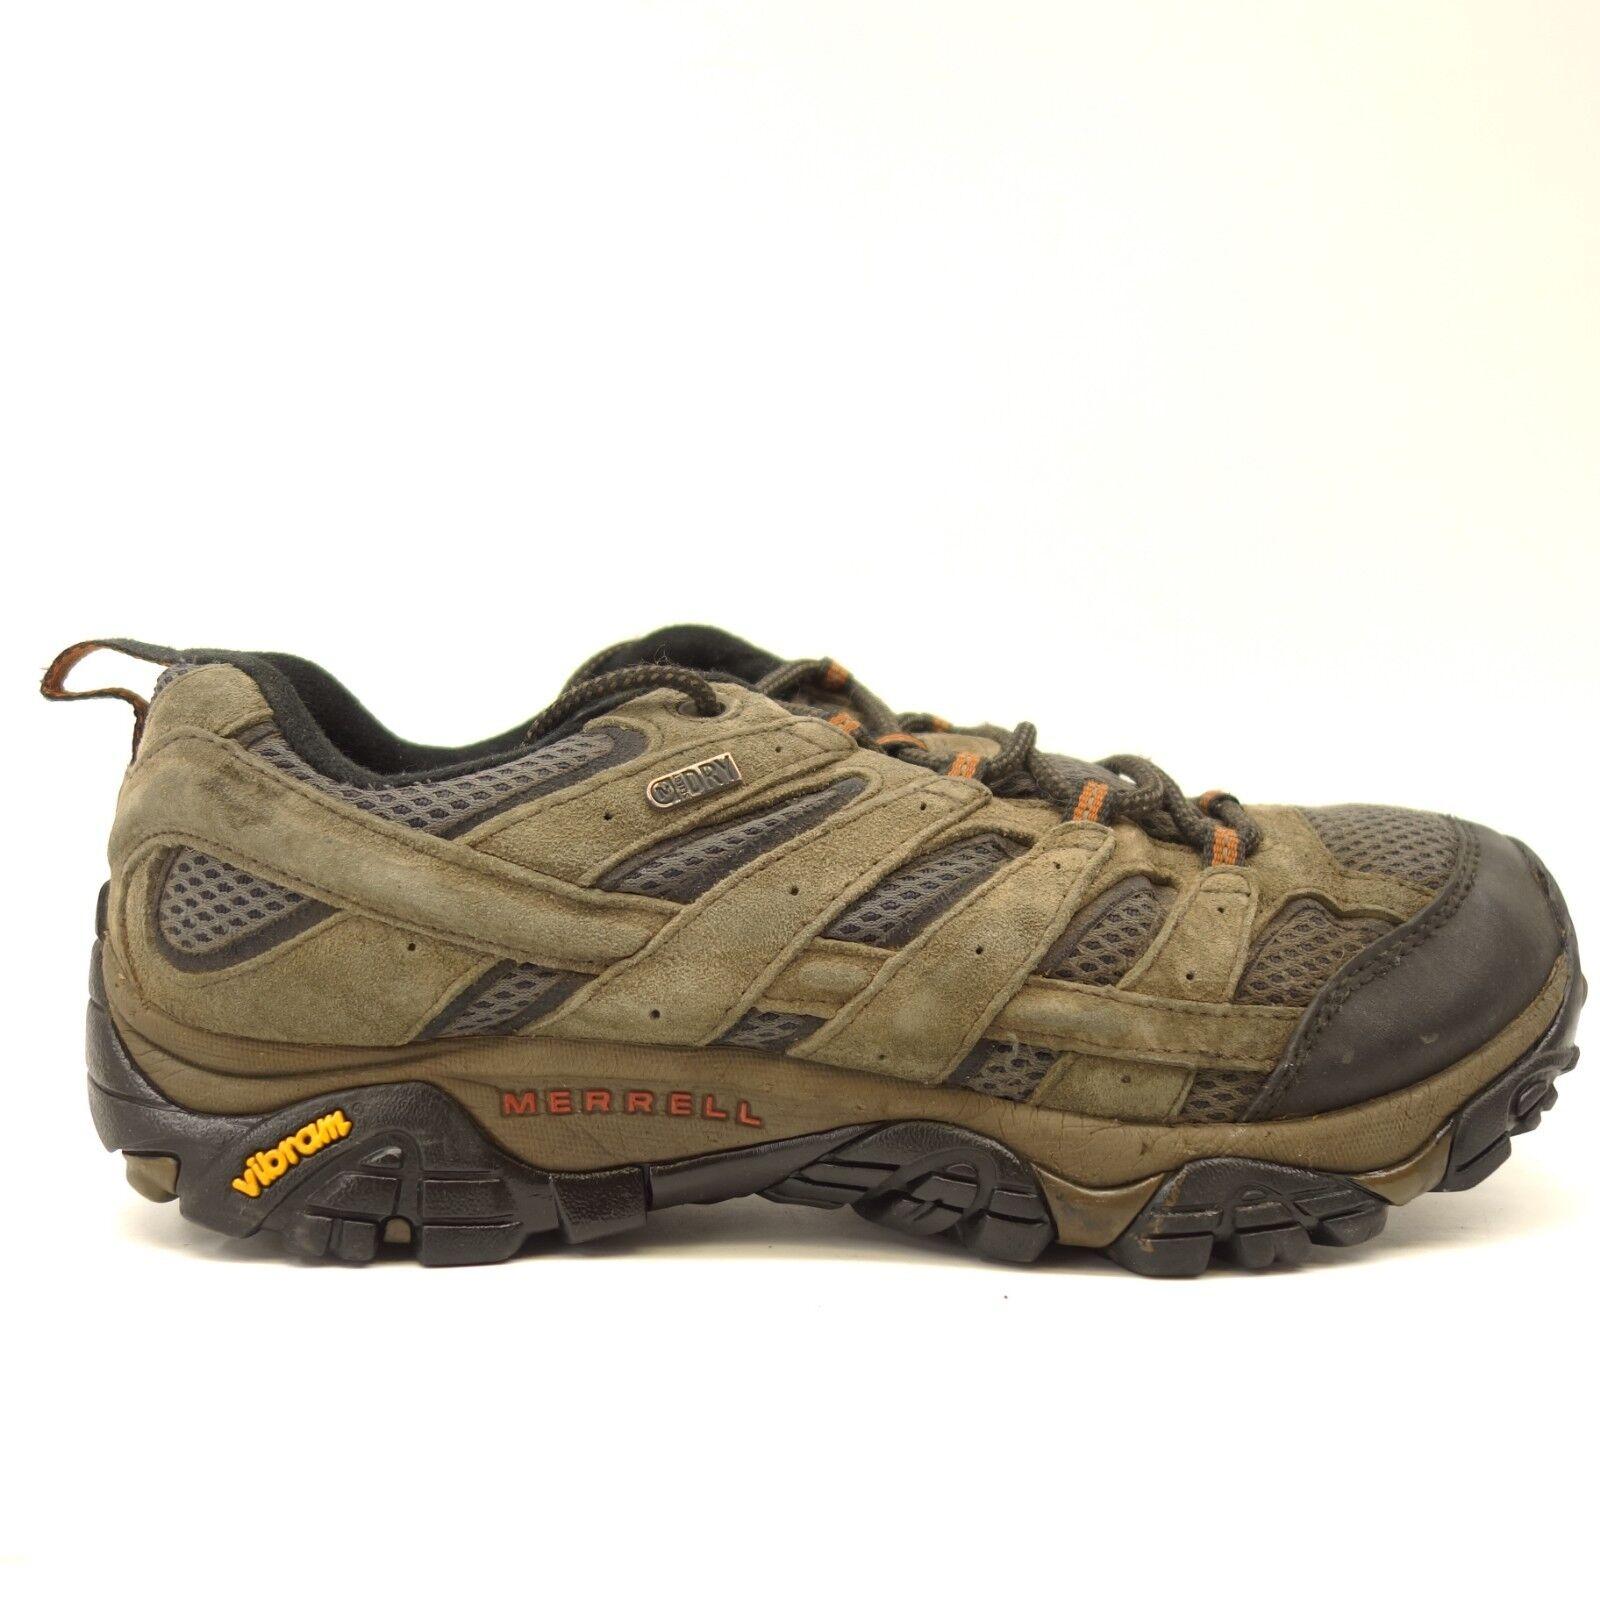 Merrell Mens Moab 2 Low Ventilator Athletic Support Hiking Trail schuhe Größe 10